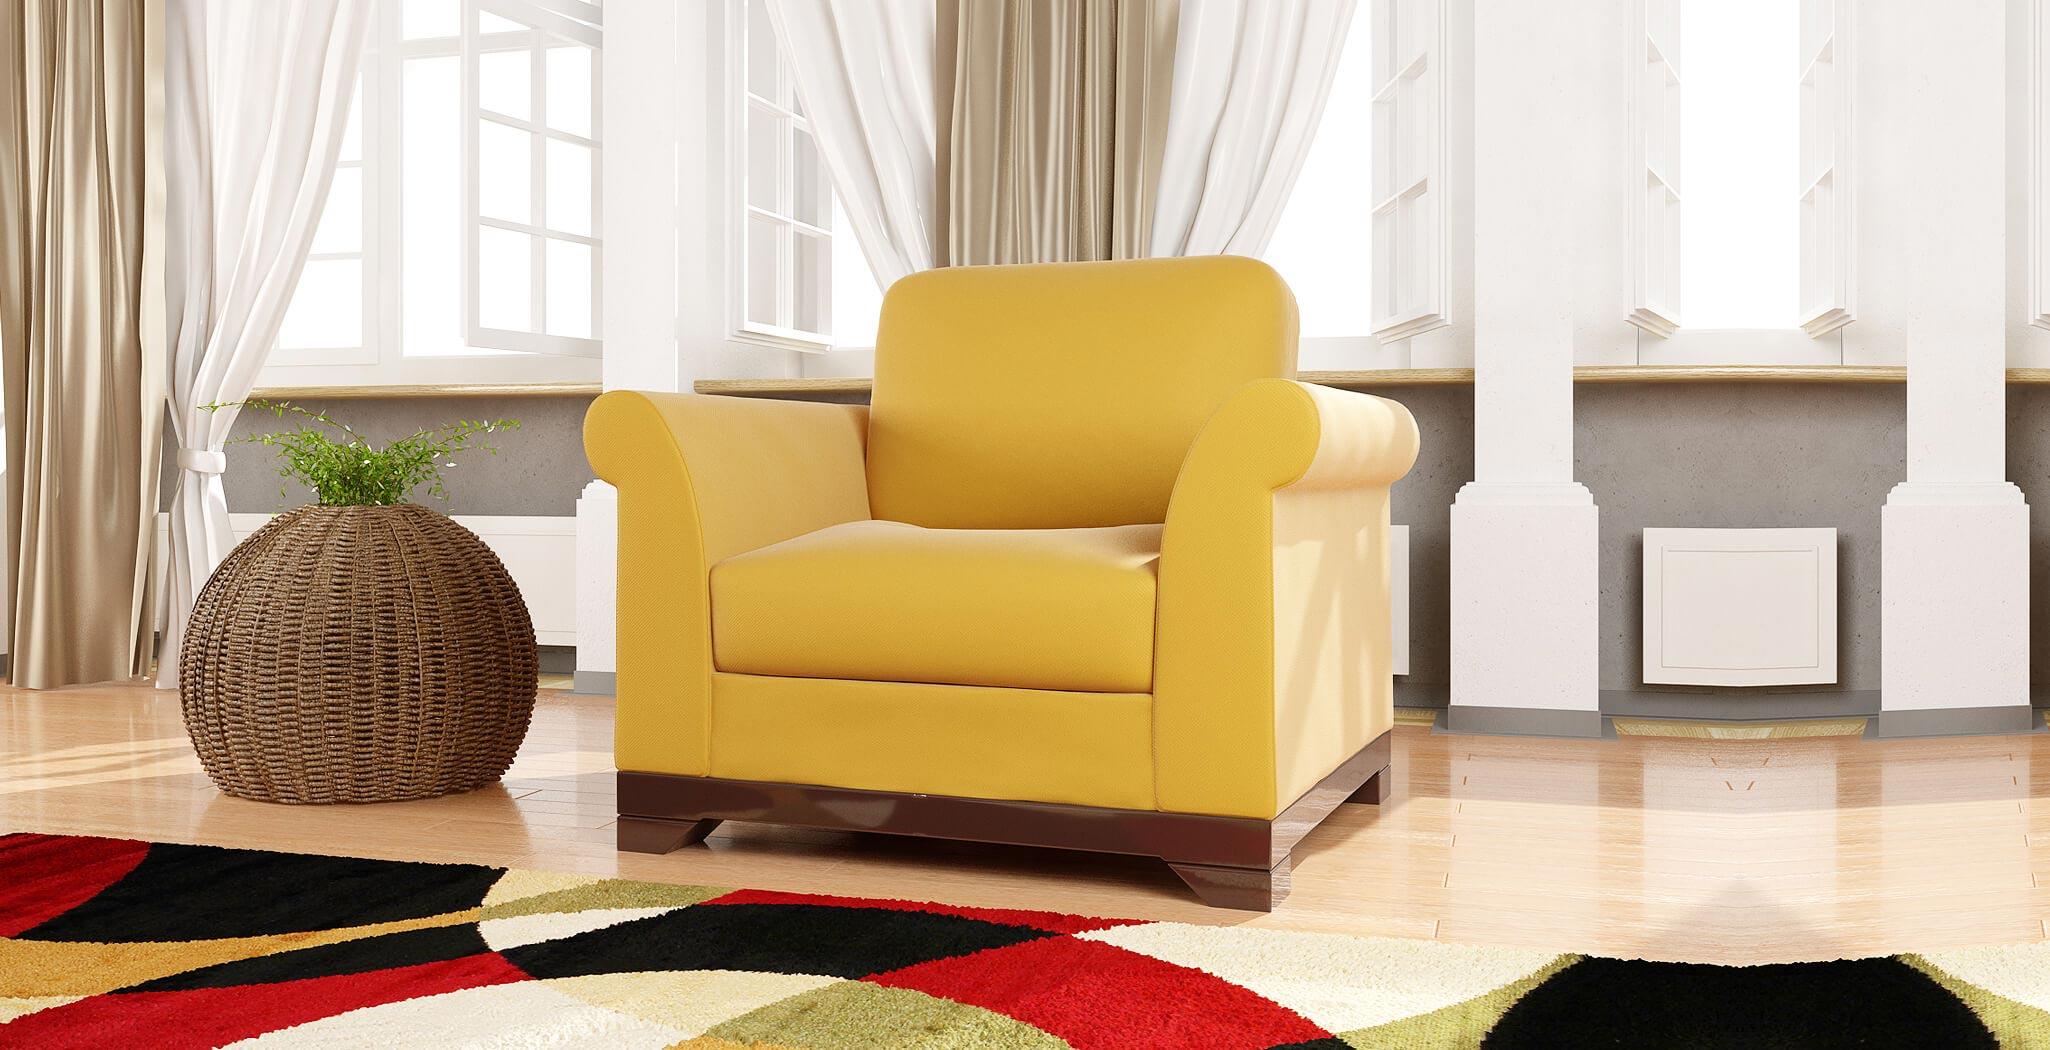 denver chair furniture gallery 5